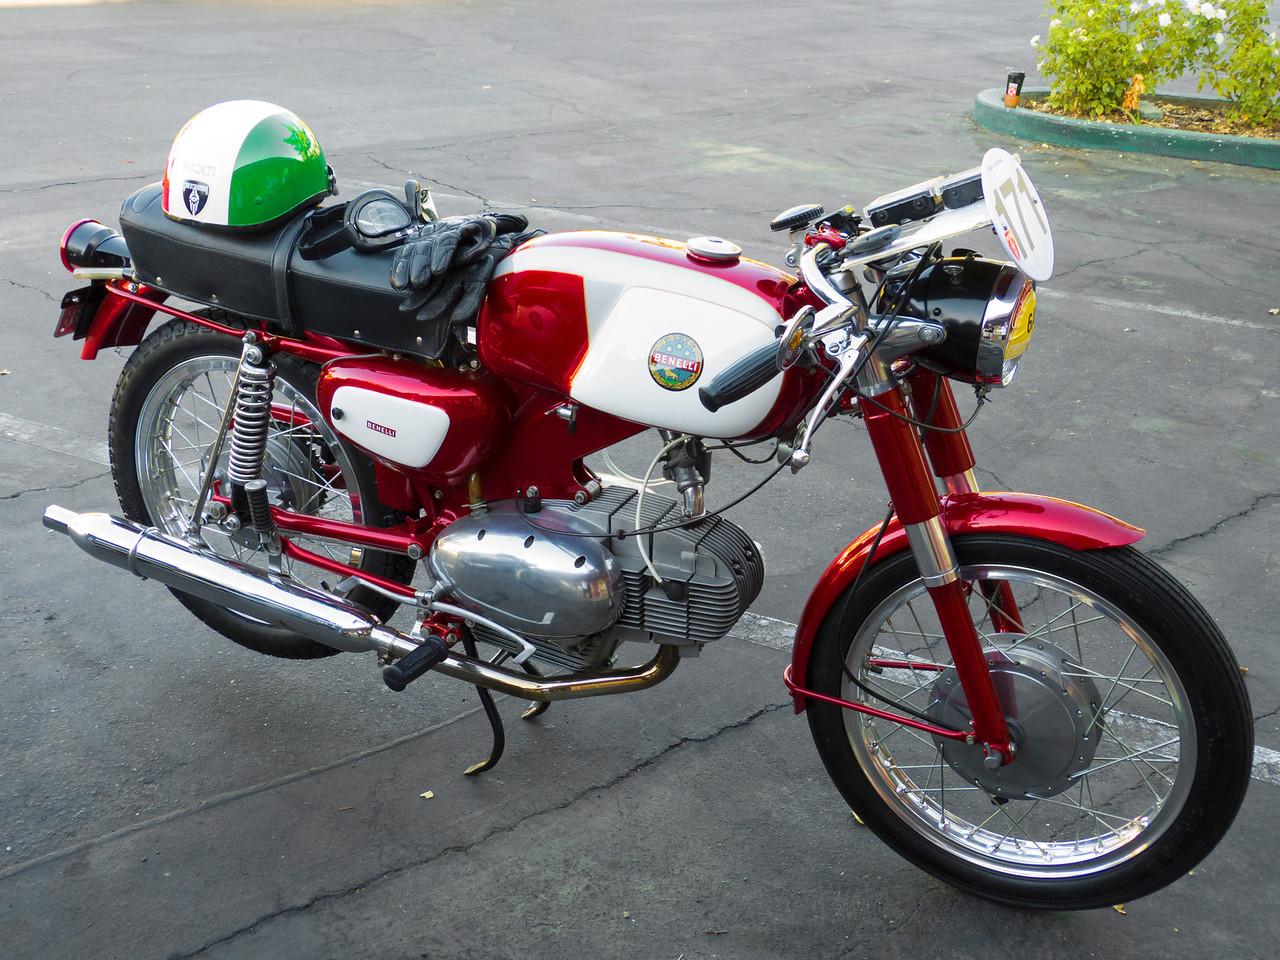 Hugo Gallina's lovely Benelli 125